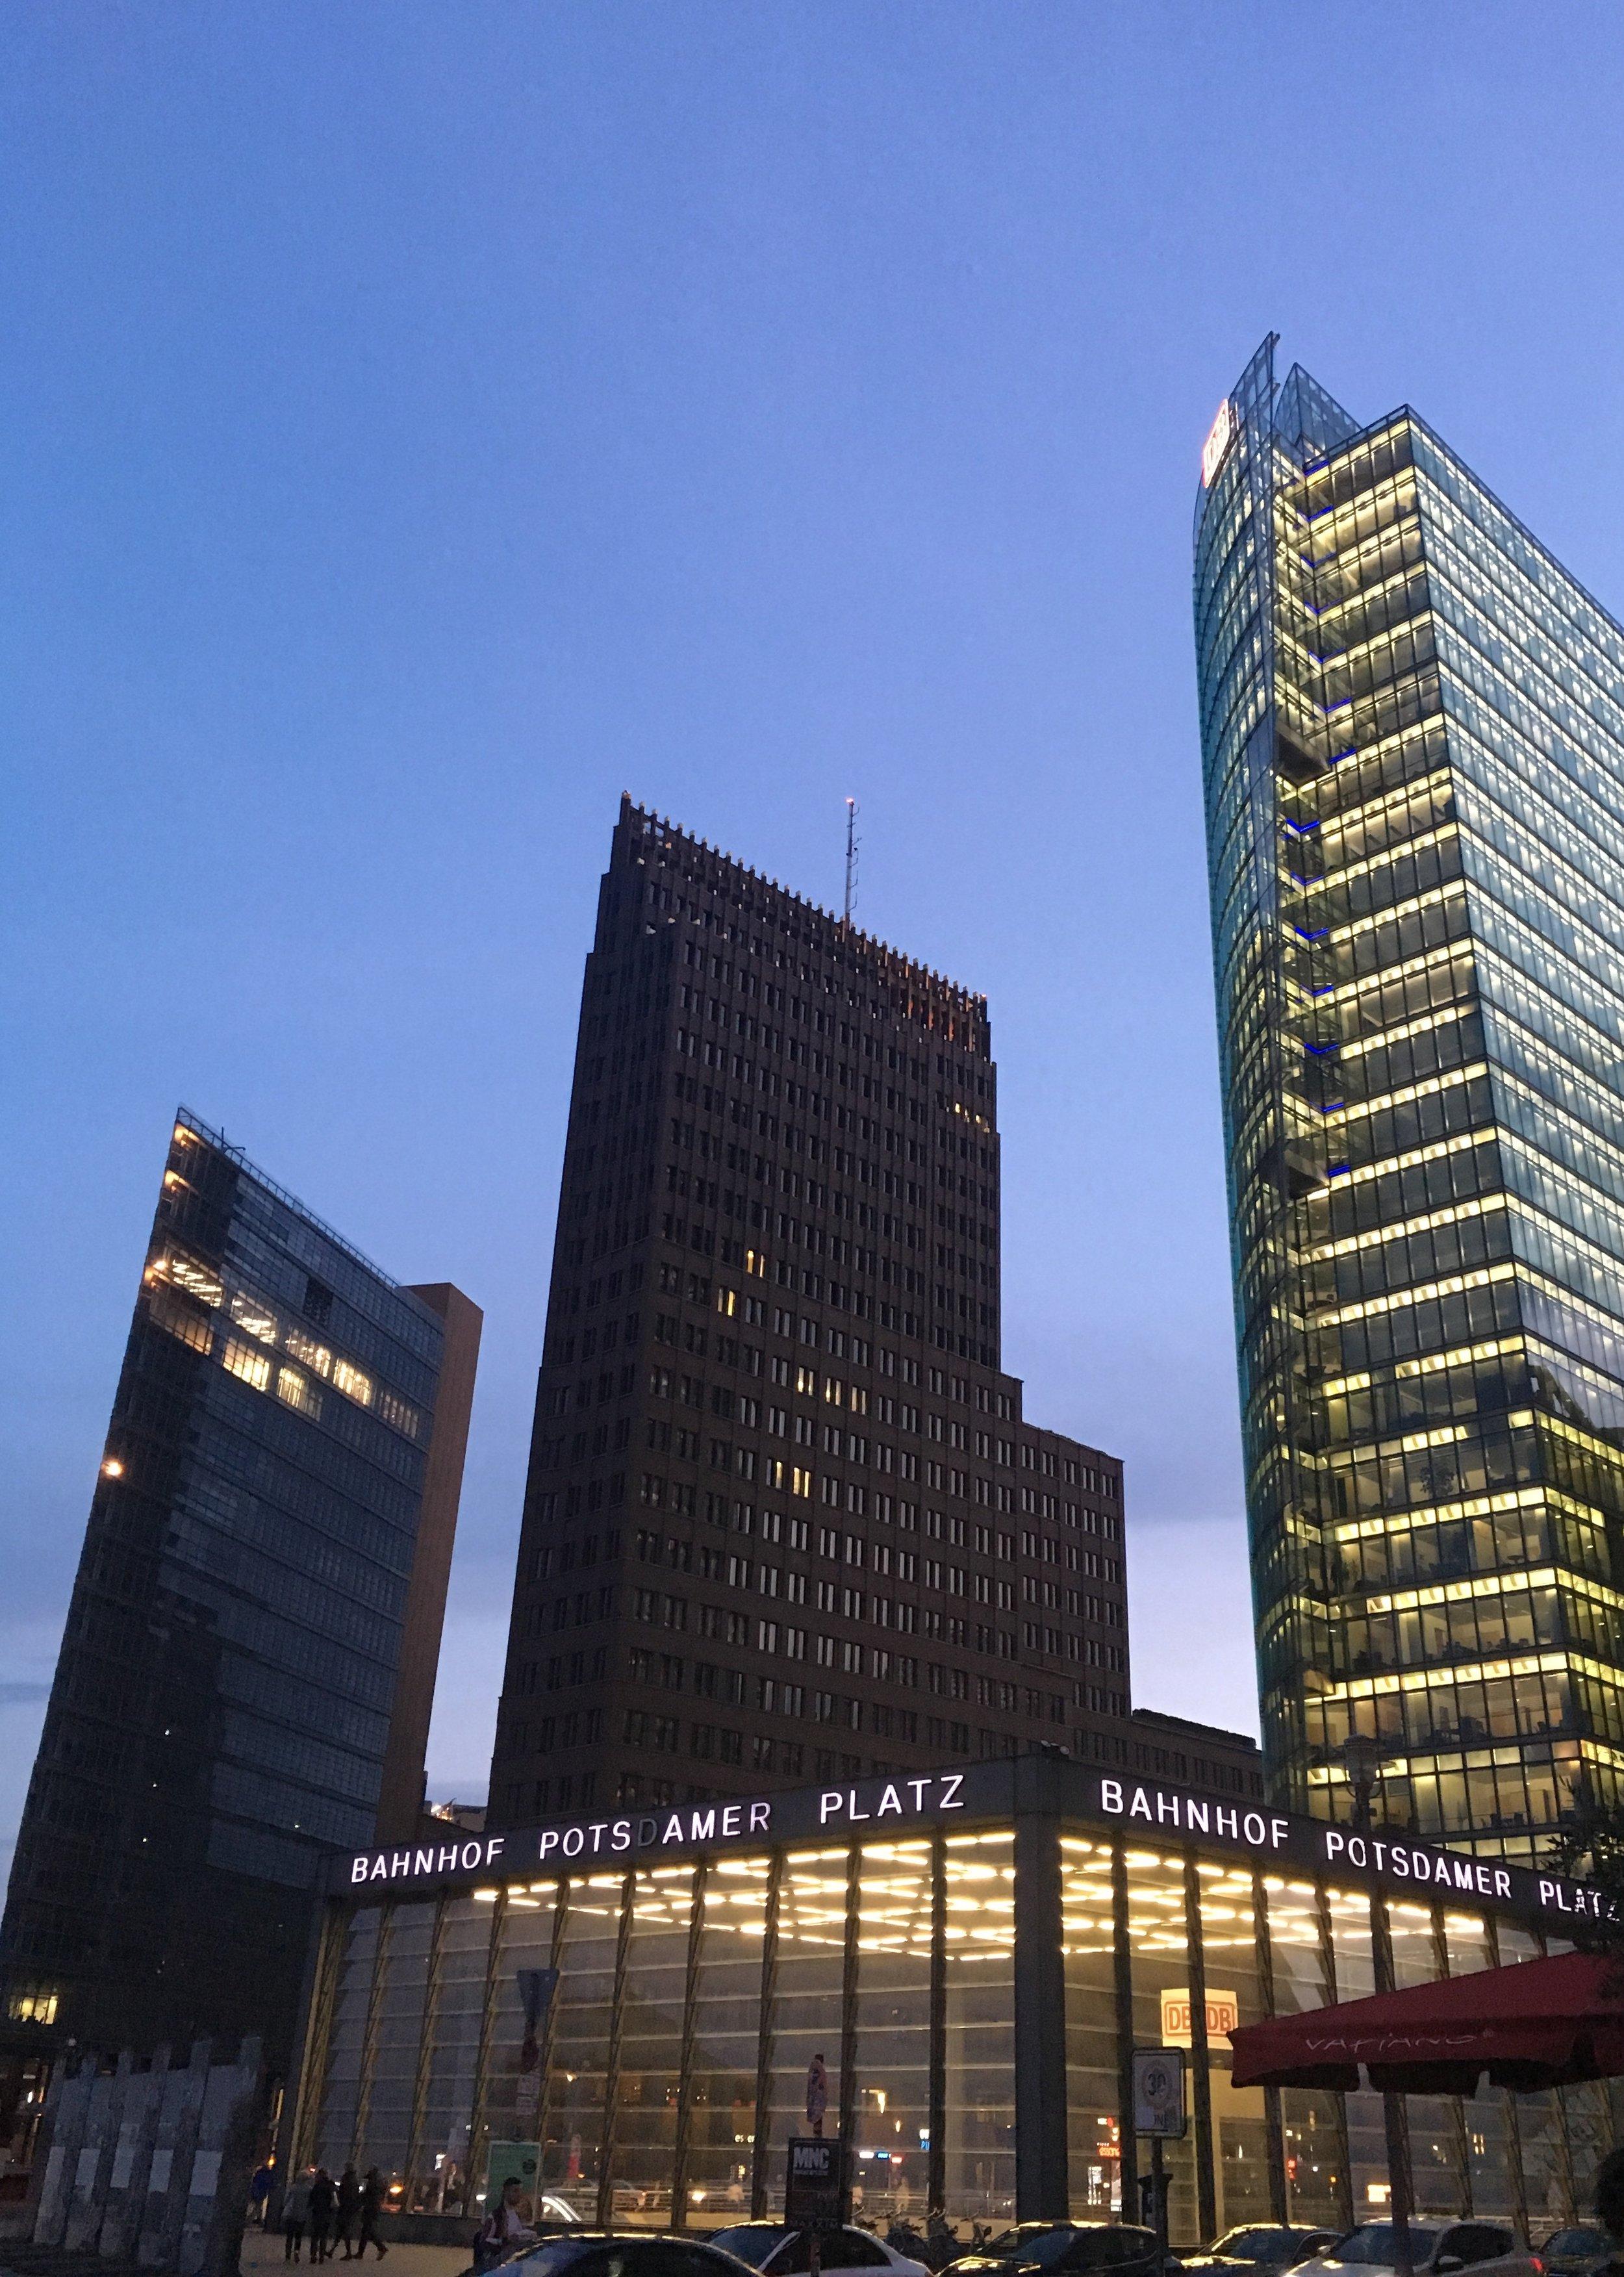 - Potsdamer Platz at dusk